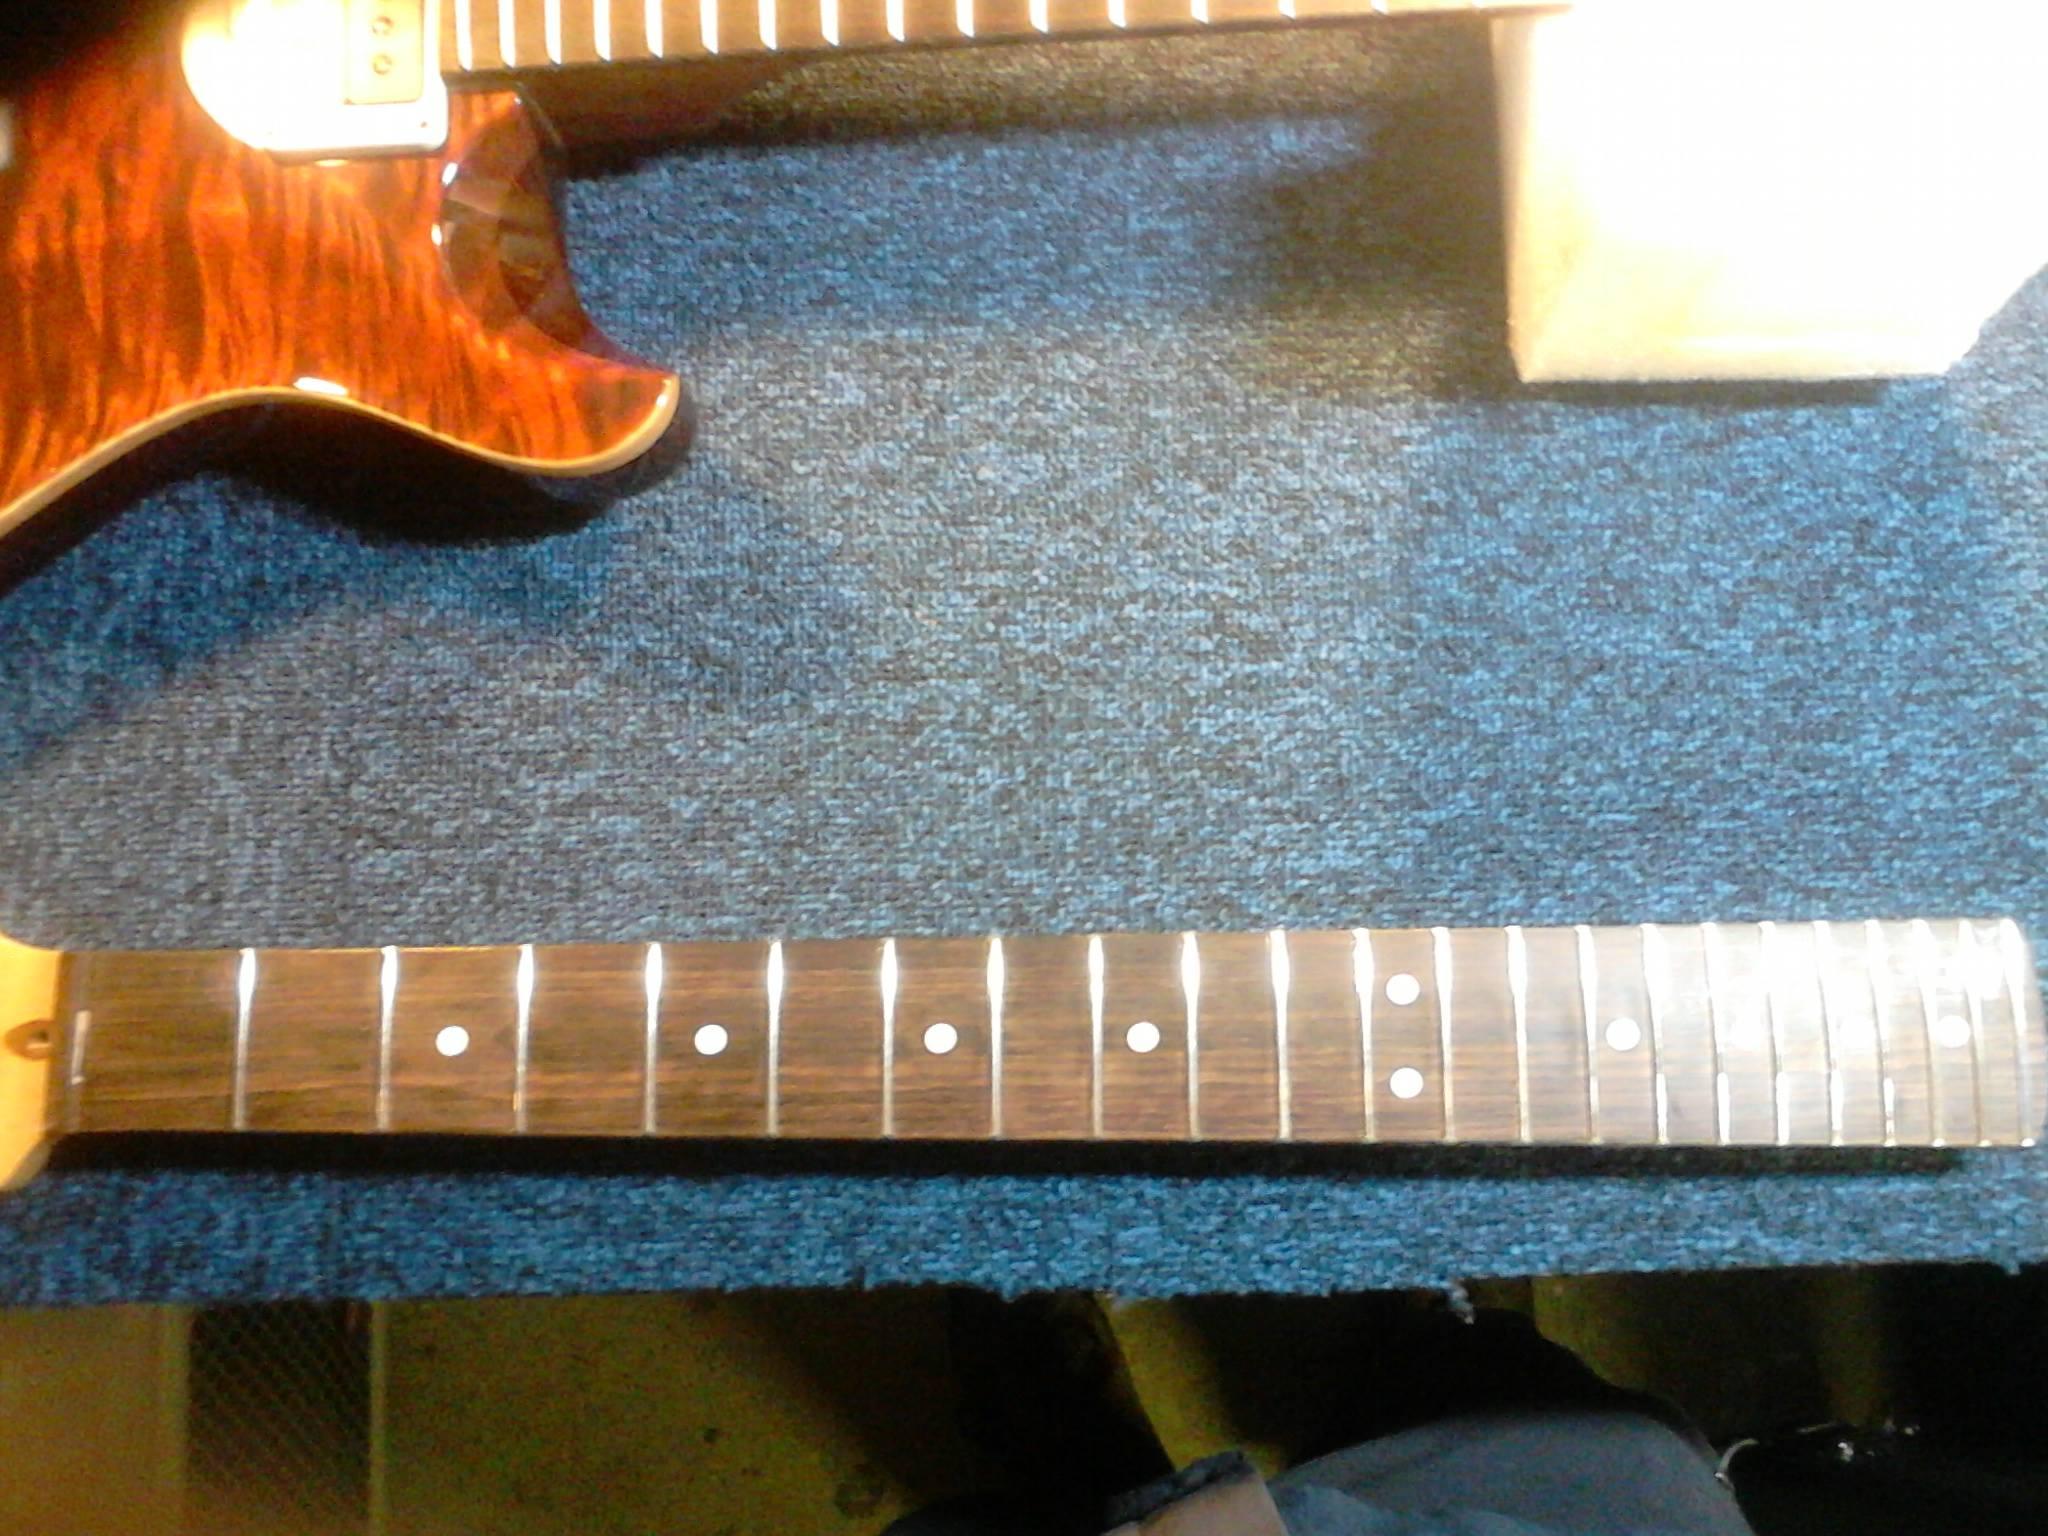 Guitar Tech Services | Re-Fret a Fender Stratocaster | Sound Affects ...